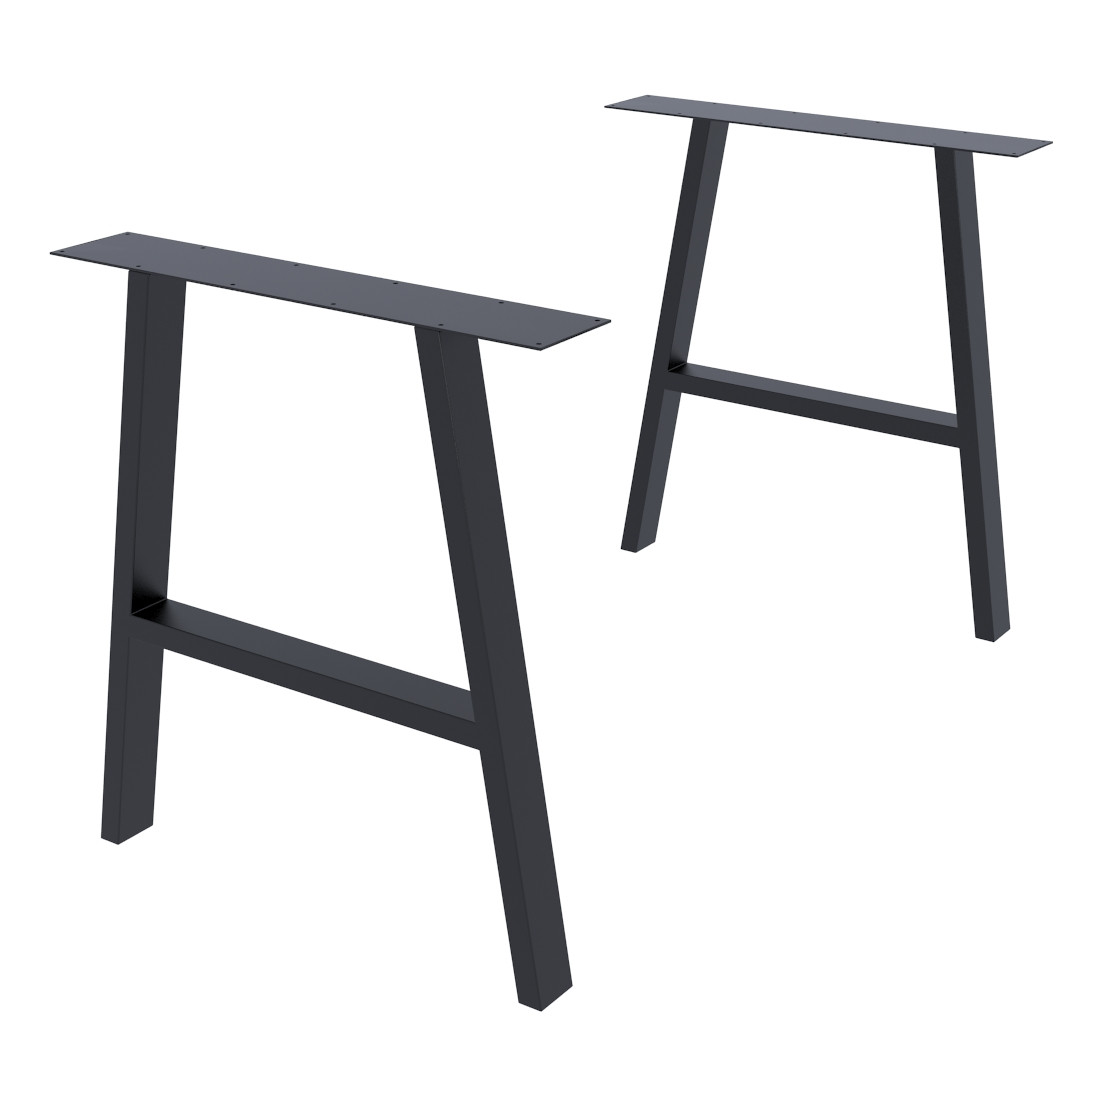 Table support Atlant Loft Design image